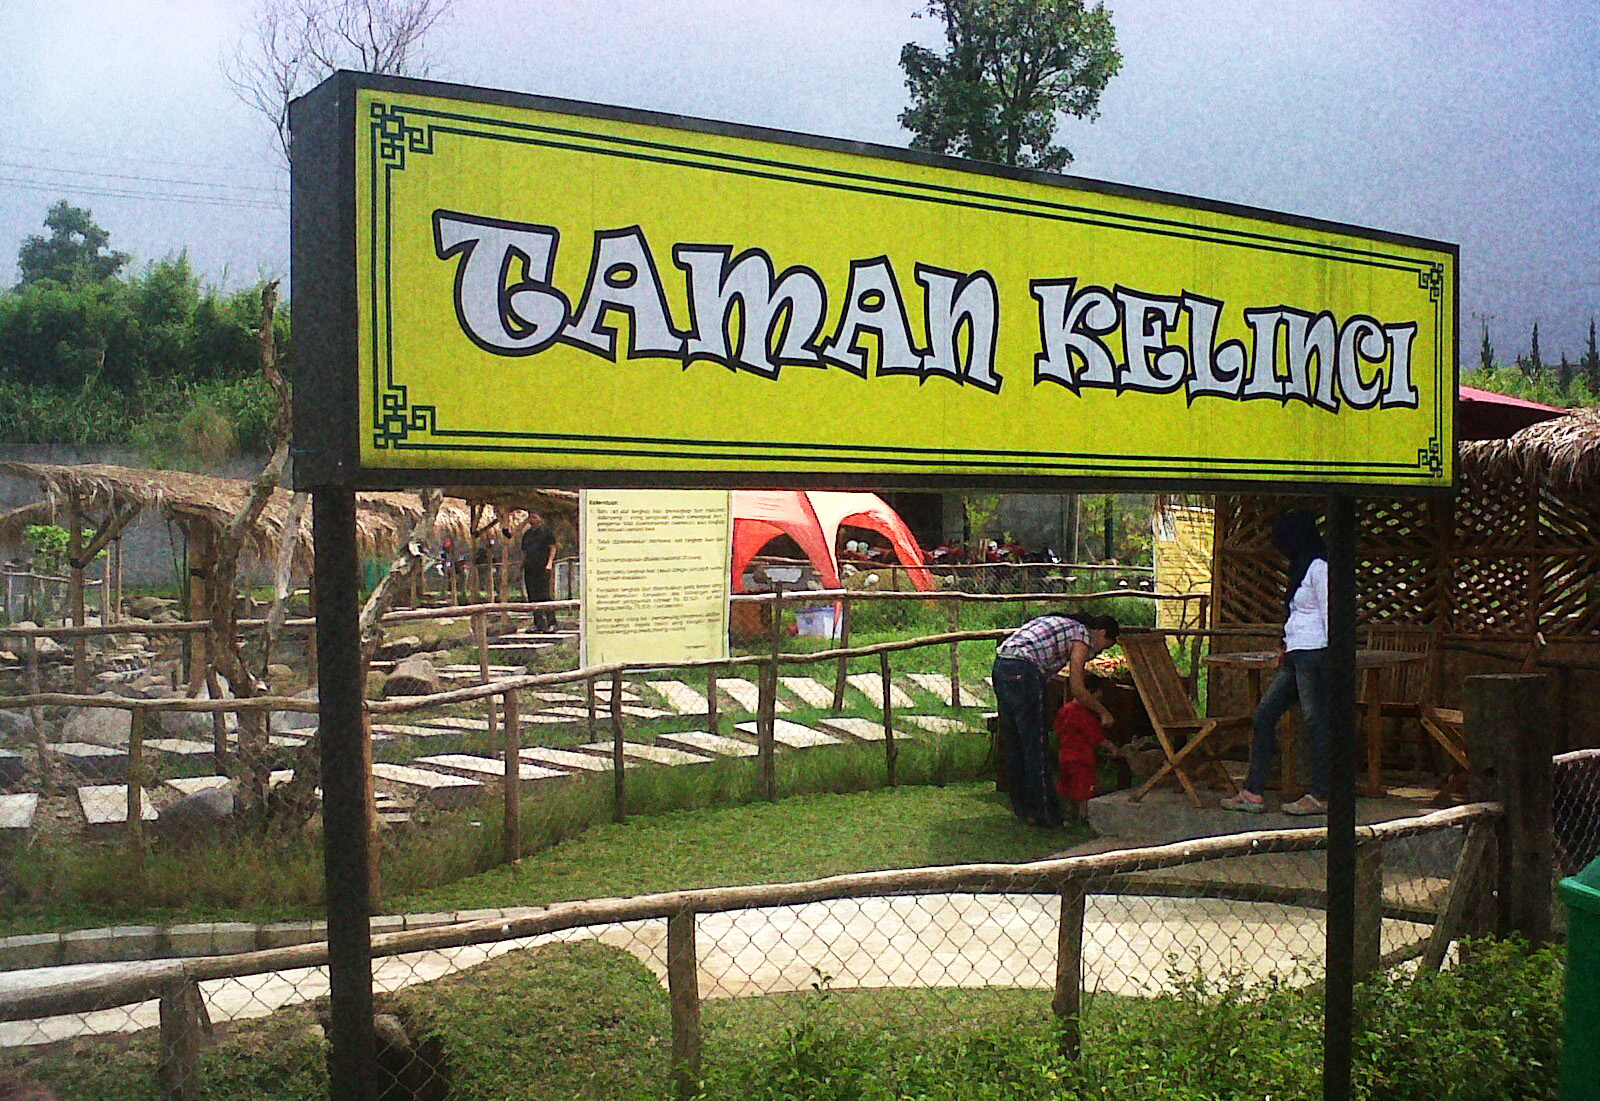 Floating Market Lembang Alternatif Lokasi Foto Pre Wedding My Tiket Masuk Fairytale Tale Error 404